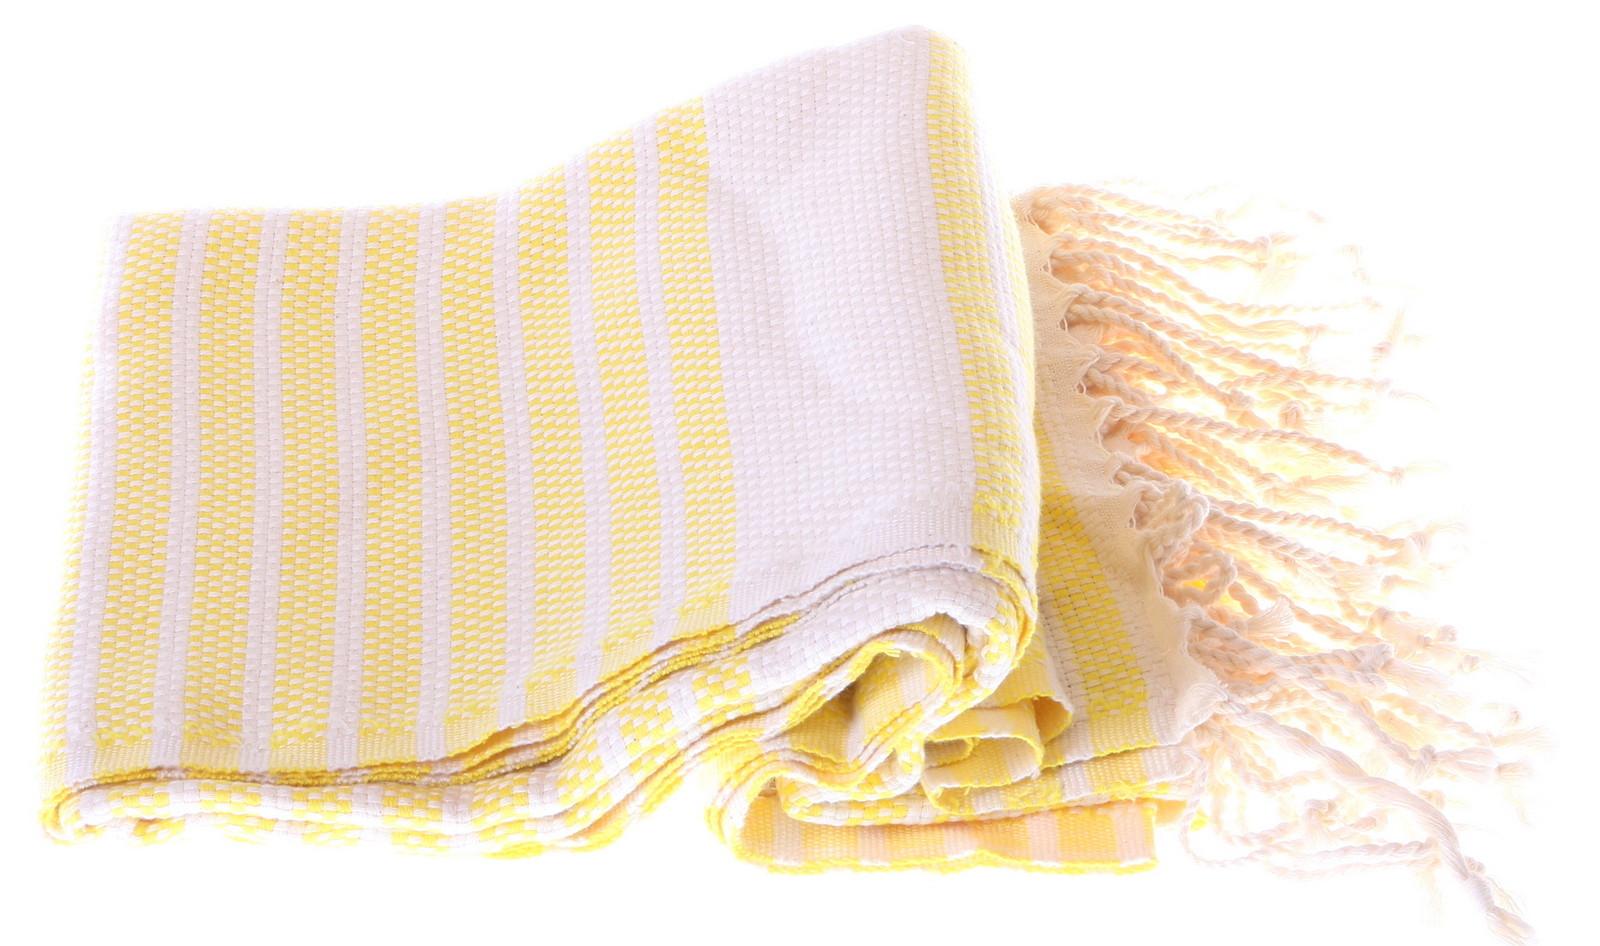 Marmara style 100% cotton hammam towel in yellow